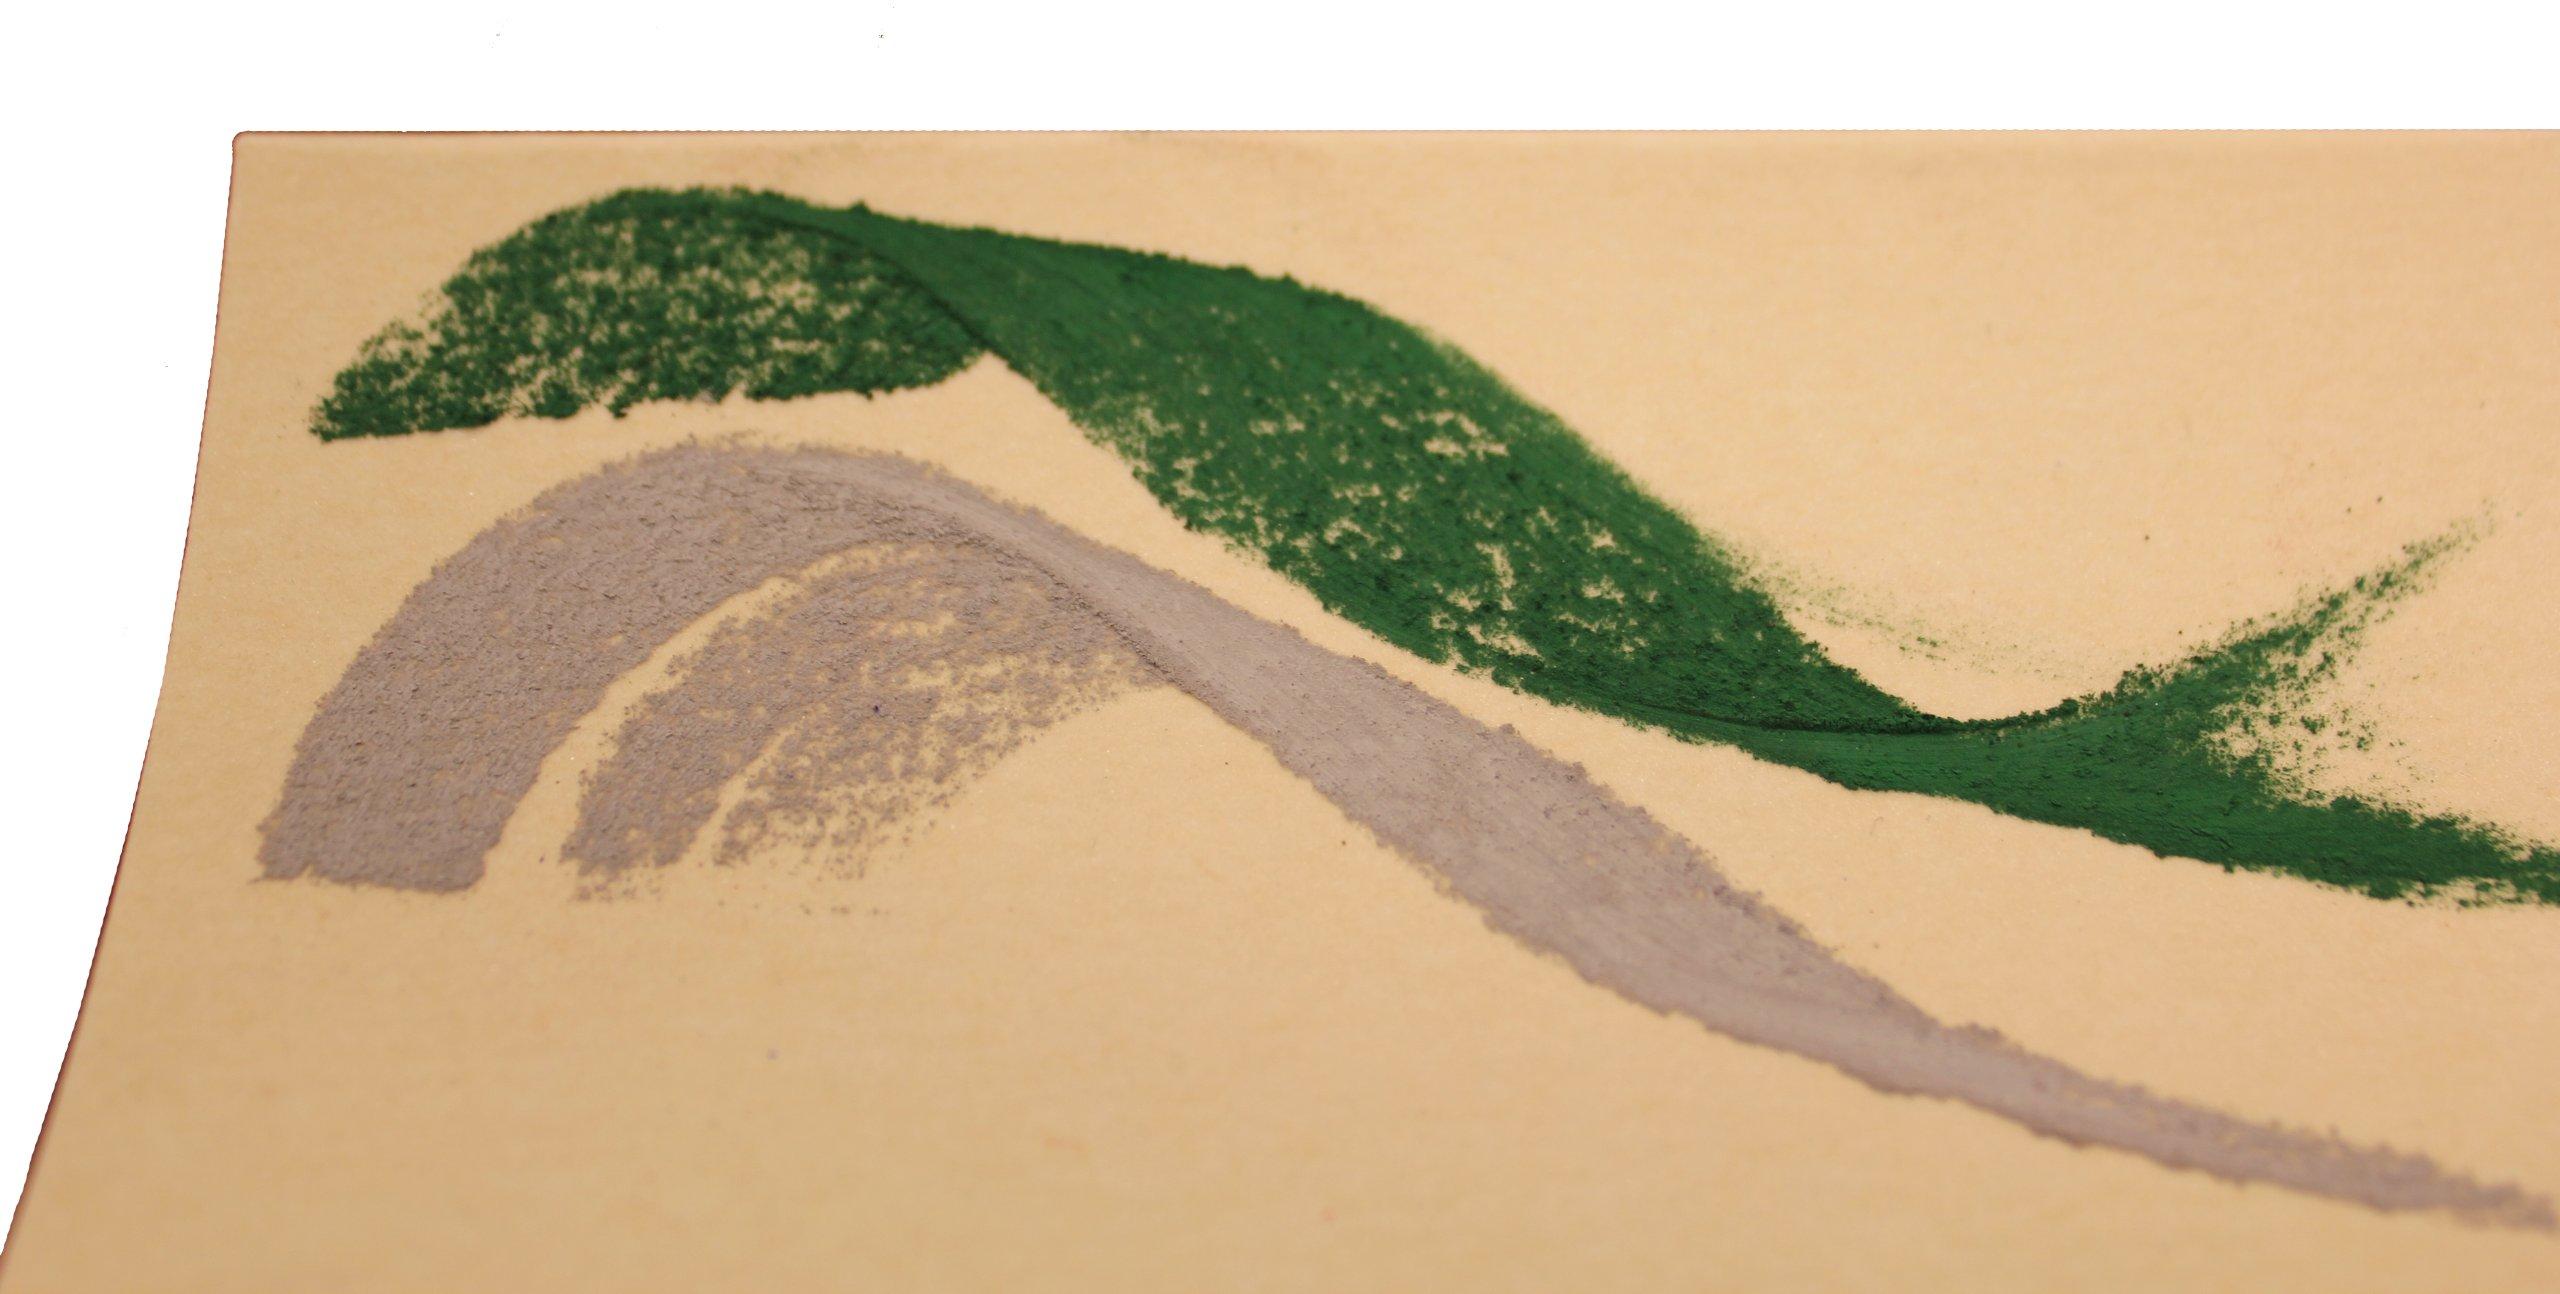 UART Sanded Pastel Paper M-148017 24-Inch/36-Inch No.600 Grade Paper, 10-Pack by UART Sanded Pastel Paper